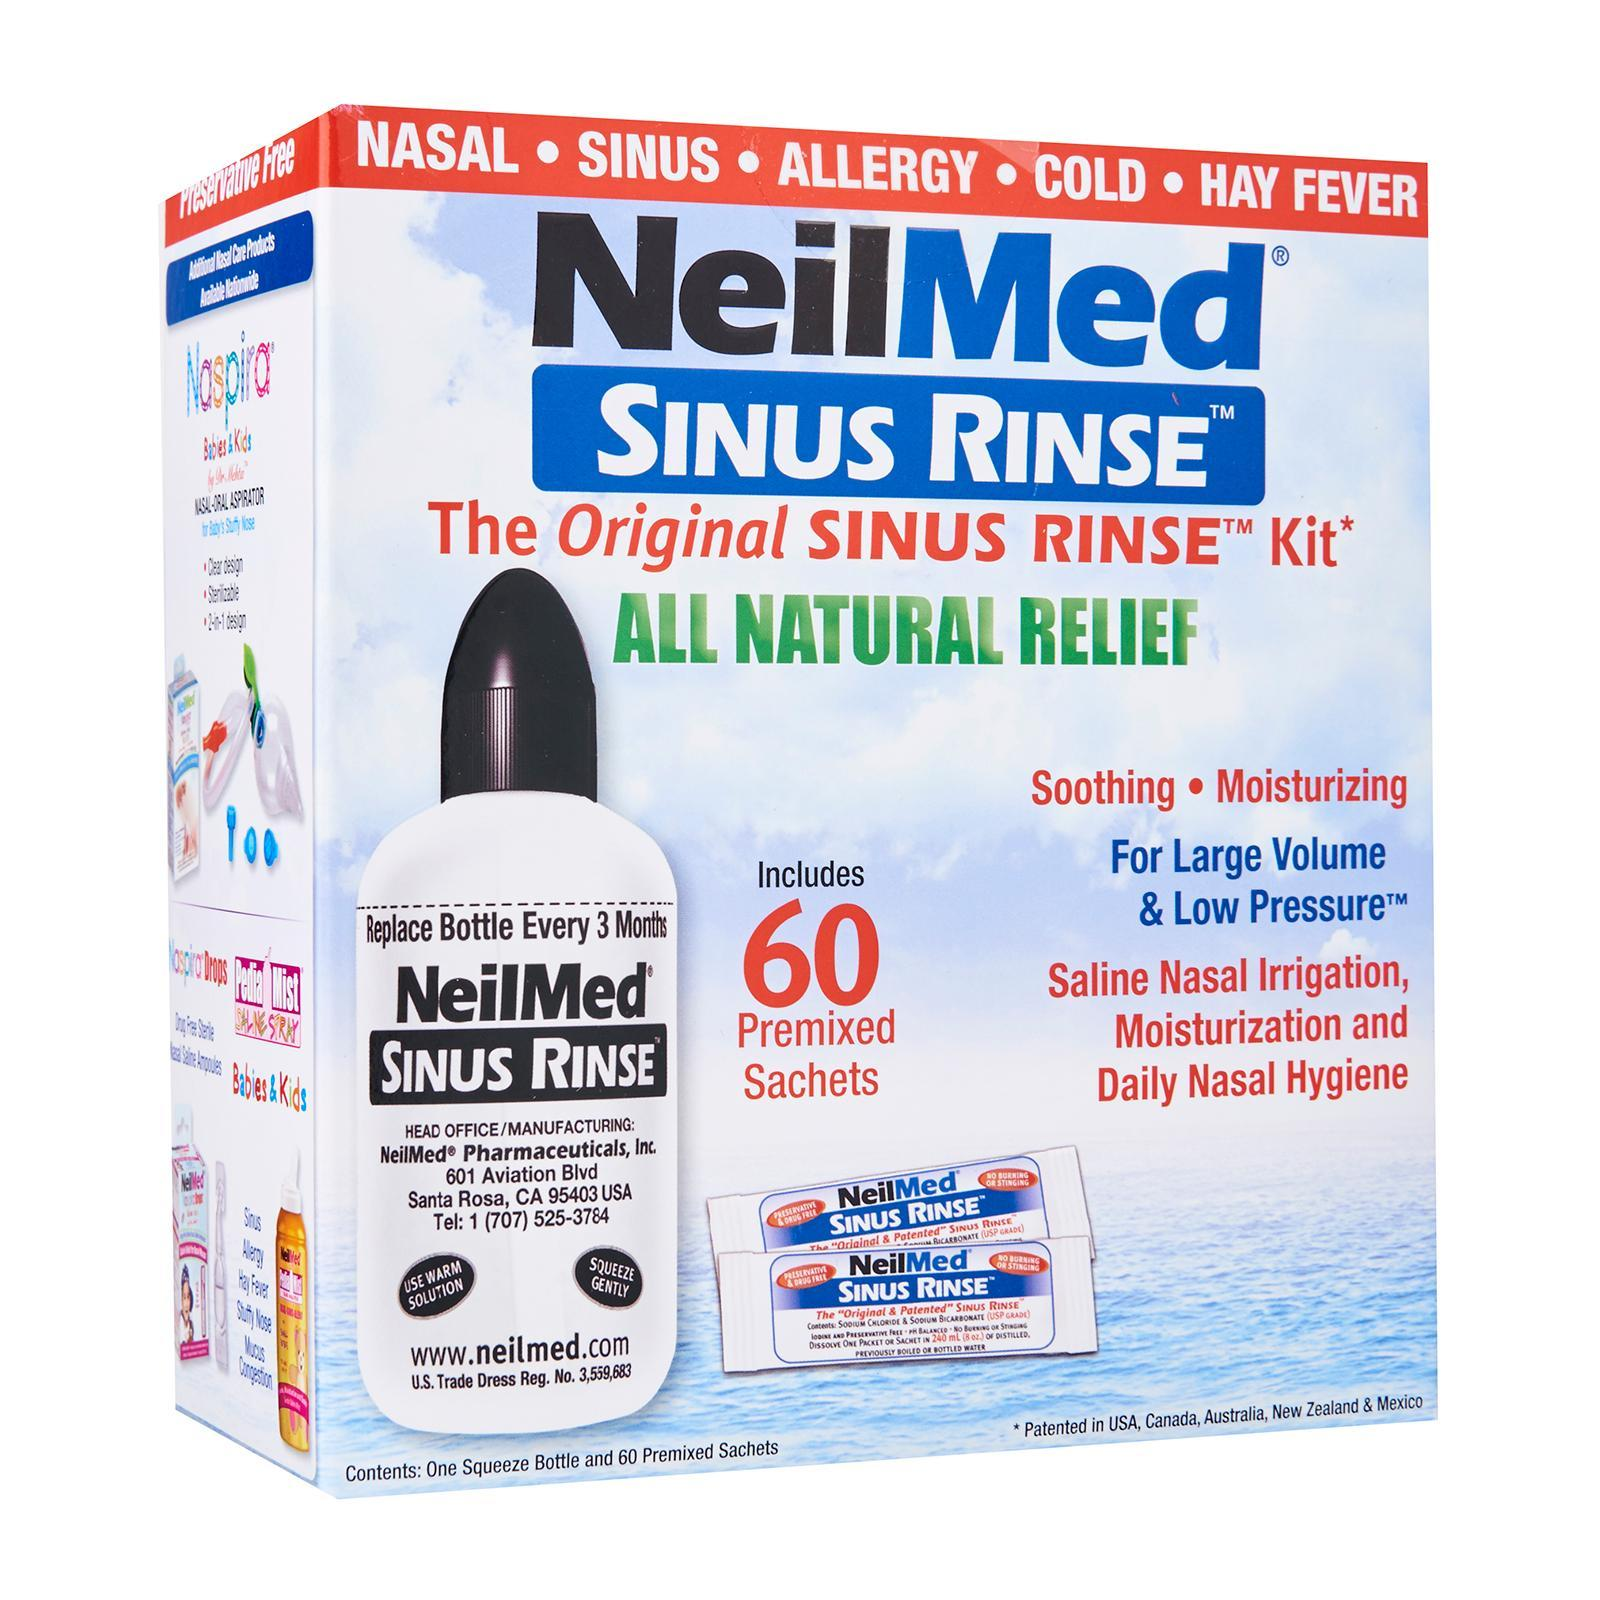 NeilMed Sinus Rinse All Natural Relief Sachets - By Medic Drugstore